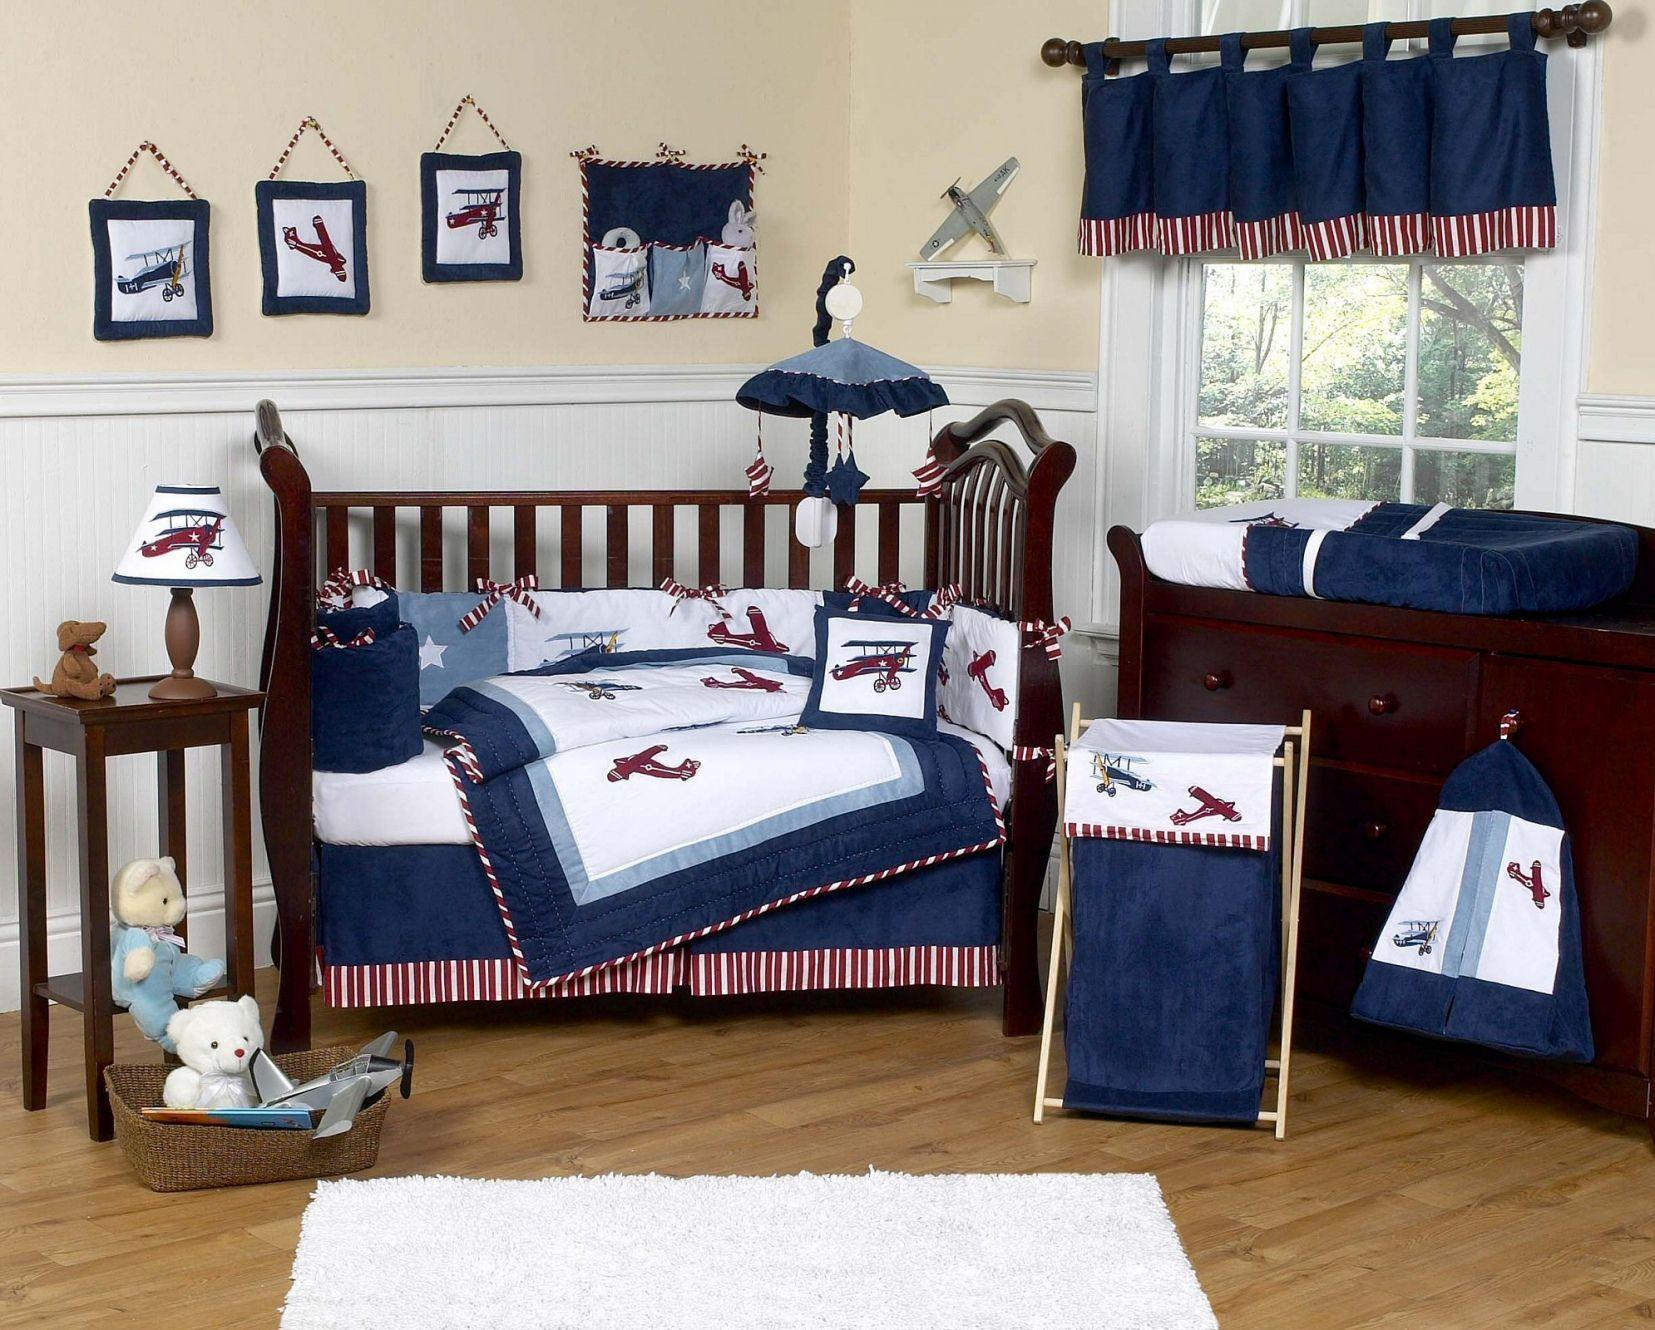 Master bedroom furniture ideas   Airplane toddler Bedding  Master Bedroom Furniture Ideas Check